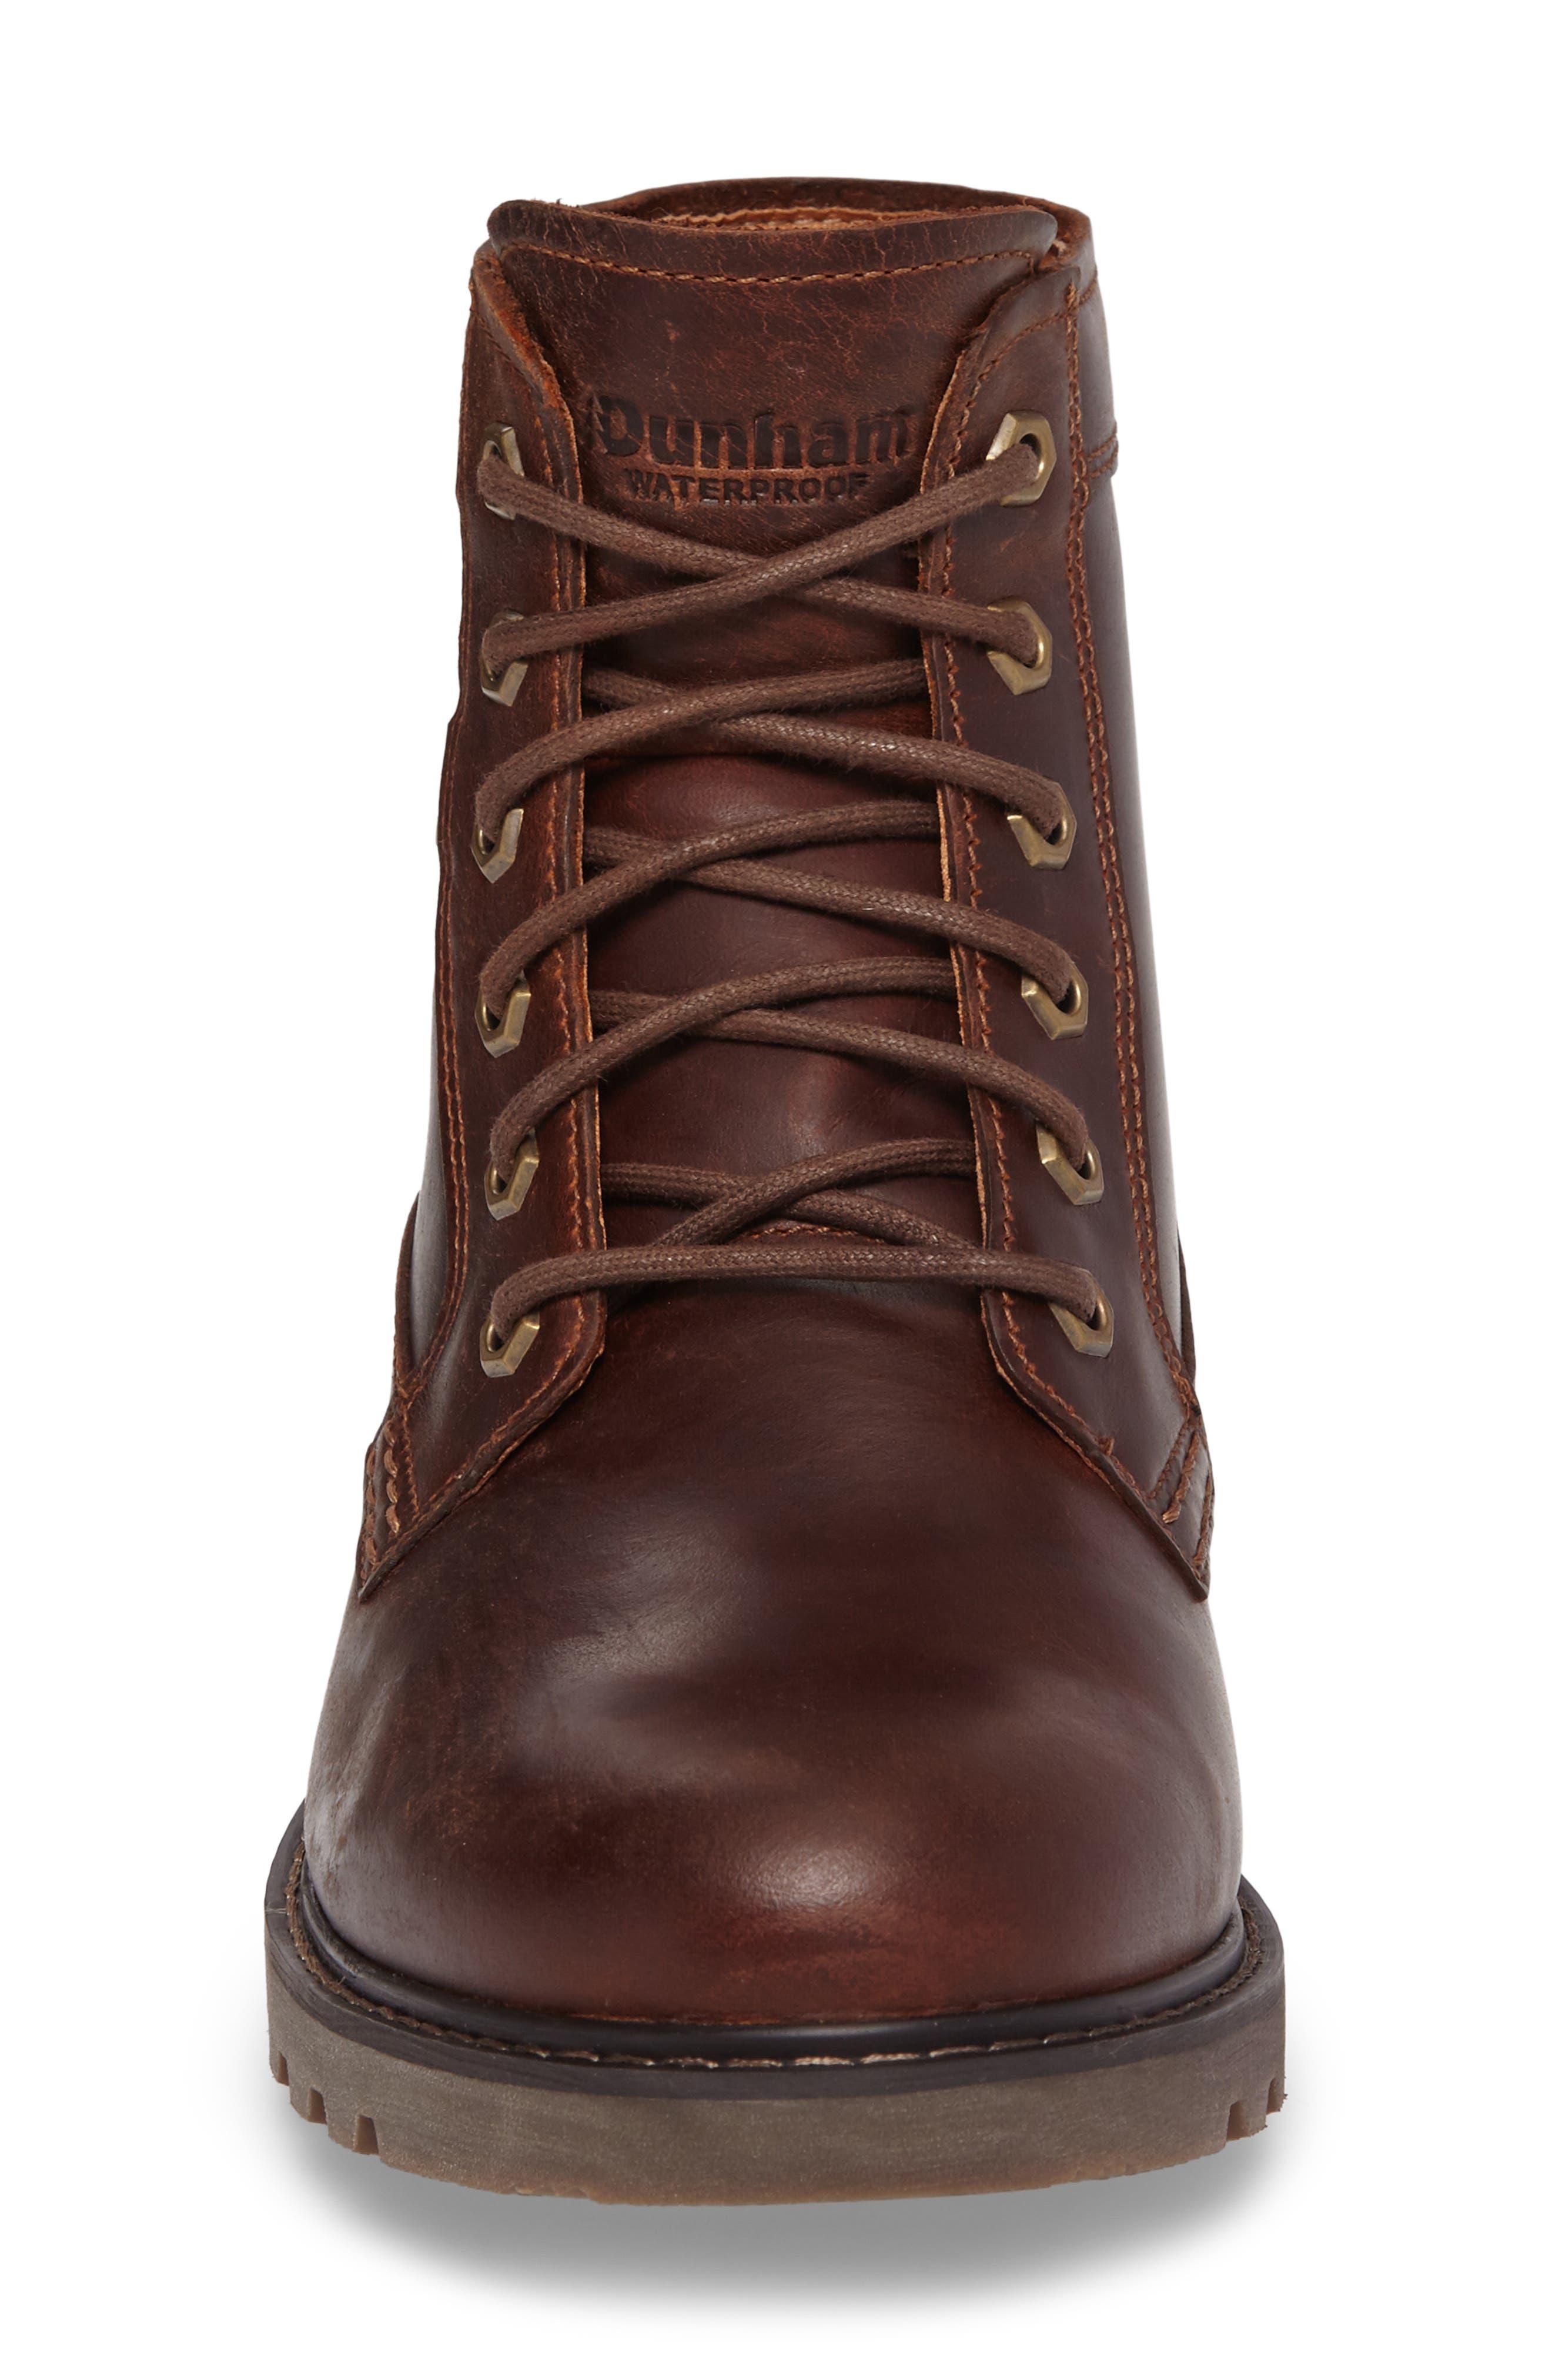 DUNHAM, Royalton Plain Toe Boot, Alternate thumbnail 4, color, BROWN